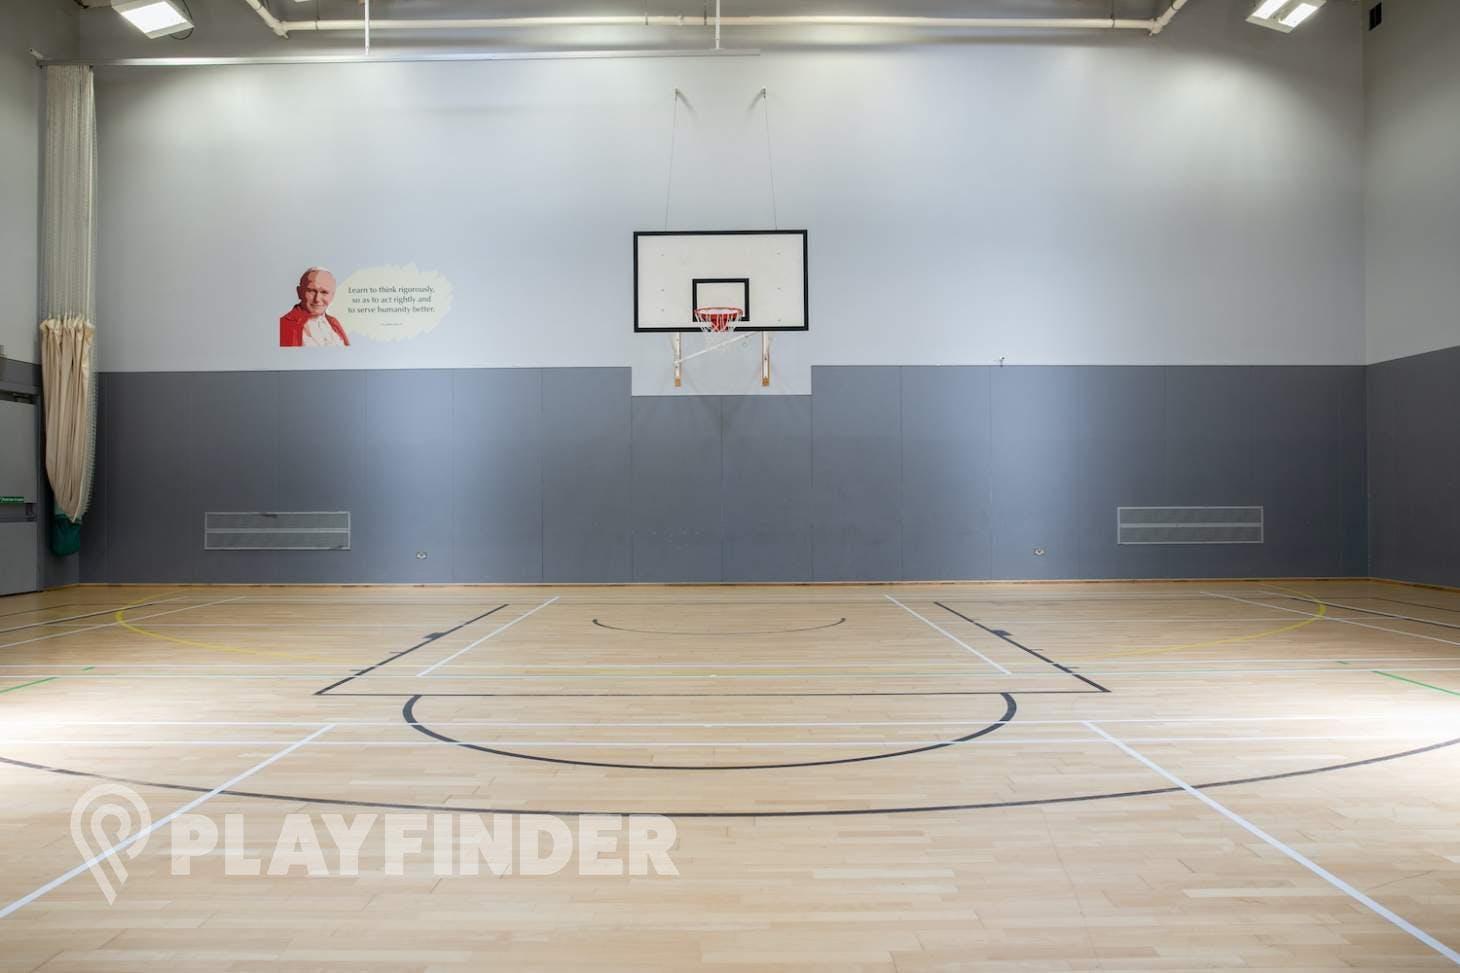 St Aloysius' College Court   Sports hall volleyball court